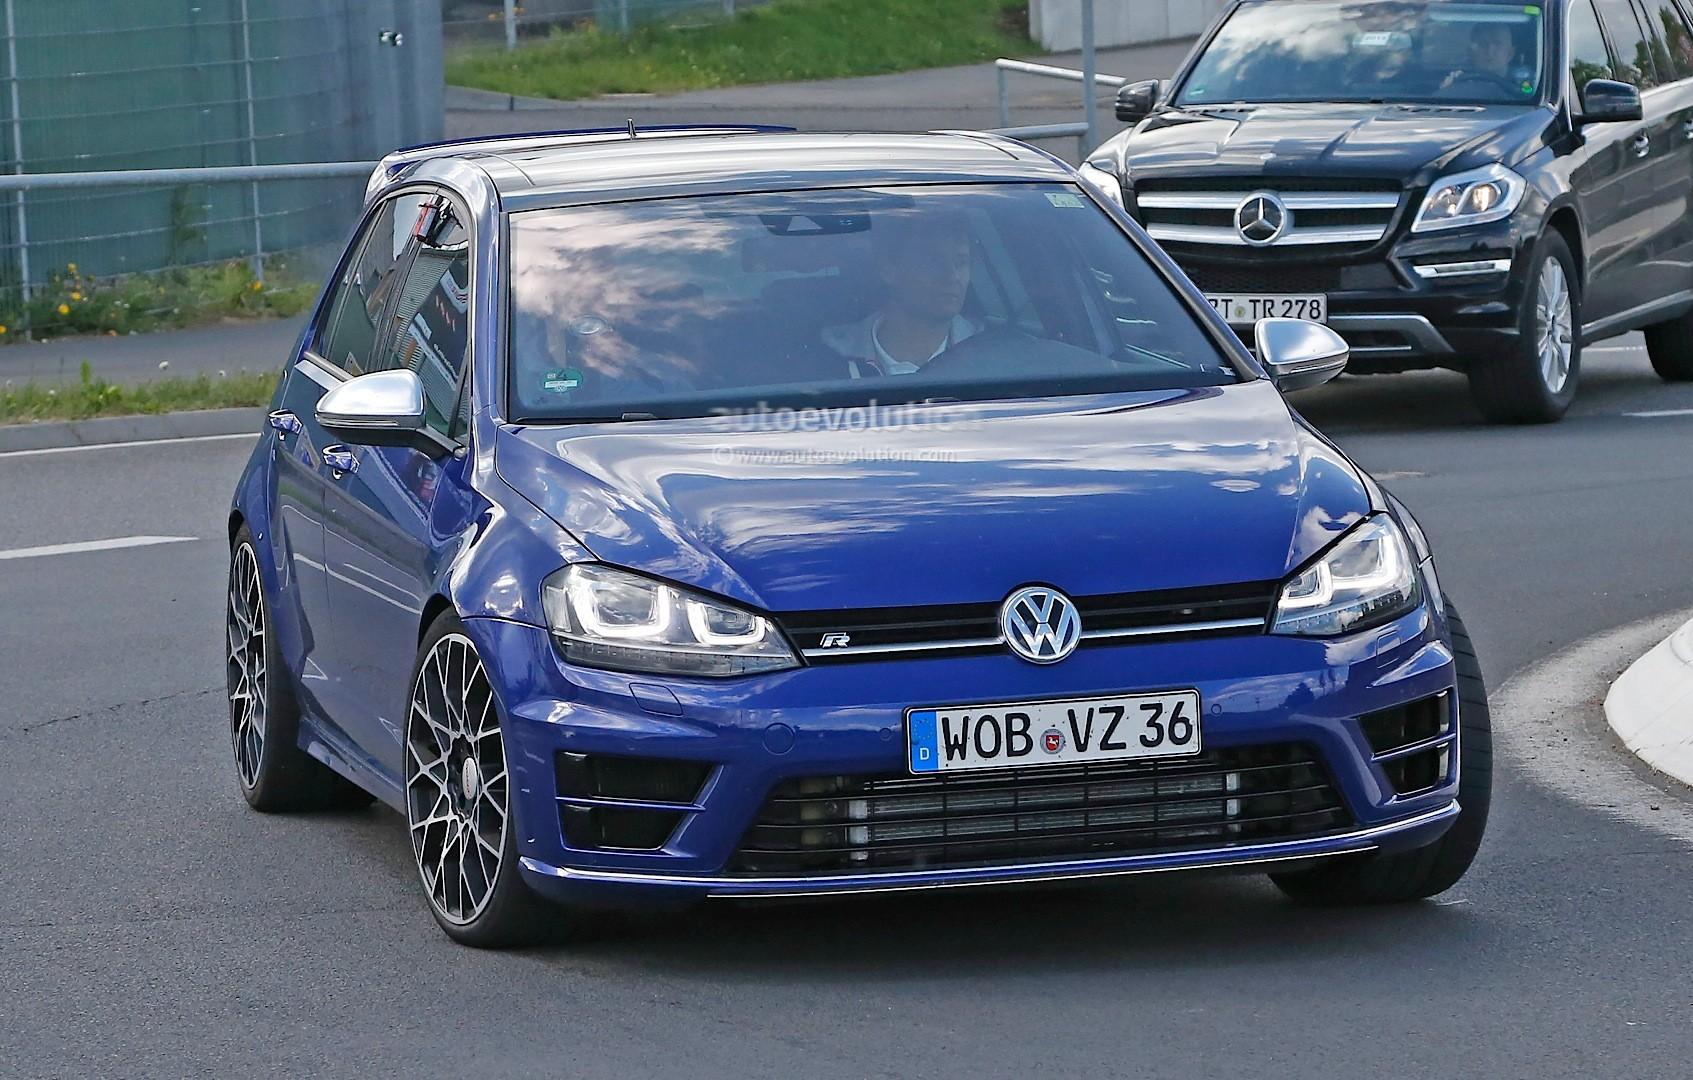 Golf R Vs Gti >> 2016 Volkswagen Golf R400 First Spy Photos Show Hyper ...